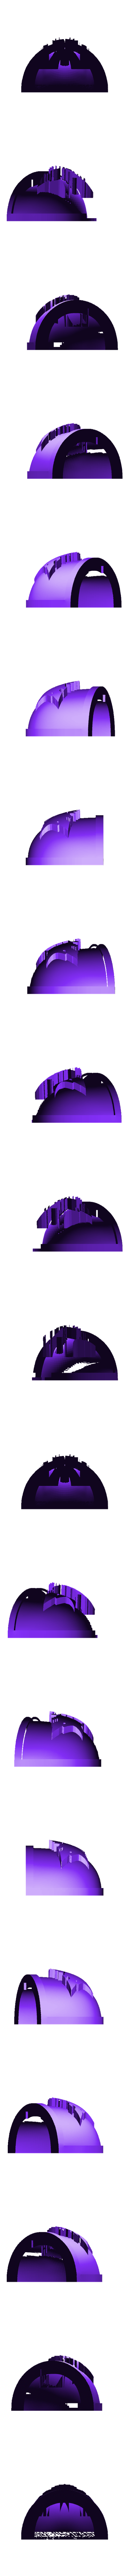 Morkai_Rep_MKVII_1_Pad.stl Download free STL file Double Wolf head Chapter insignia • 3D printing model, Tatsura